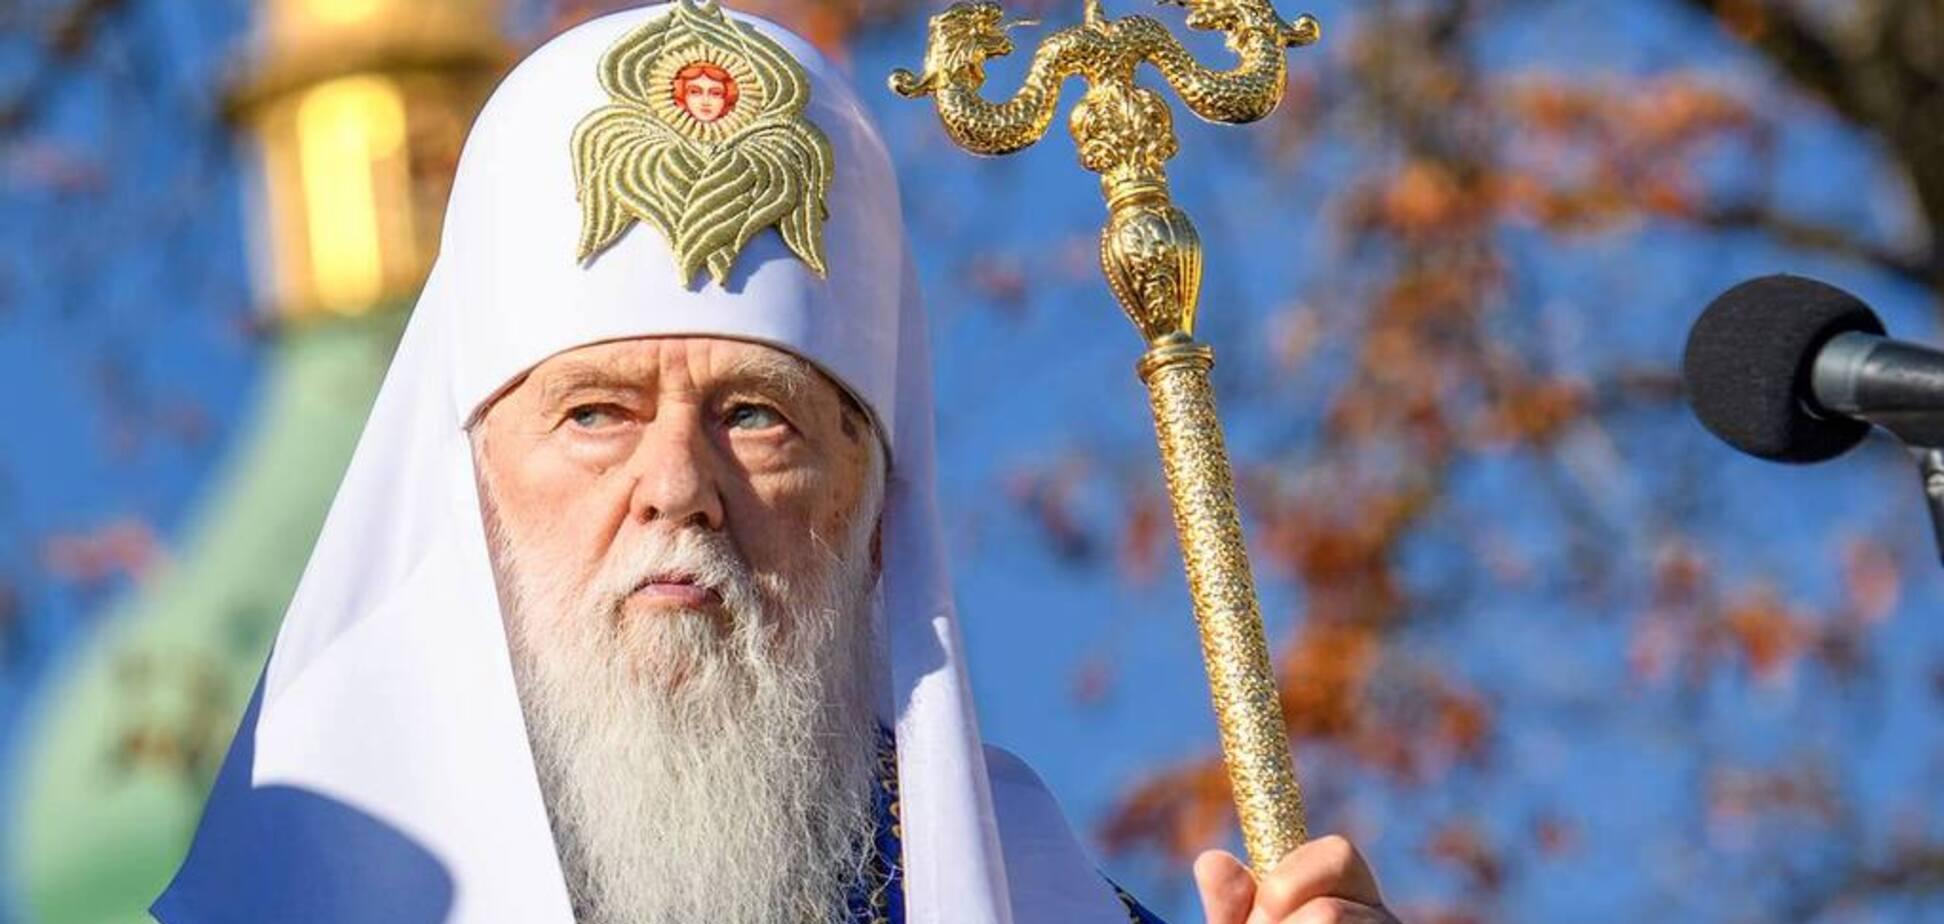 'Сам себе патриарх': Филарета обвинили в провокациях